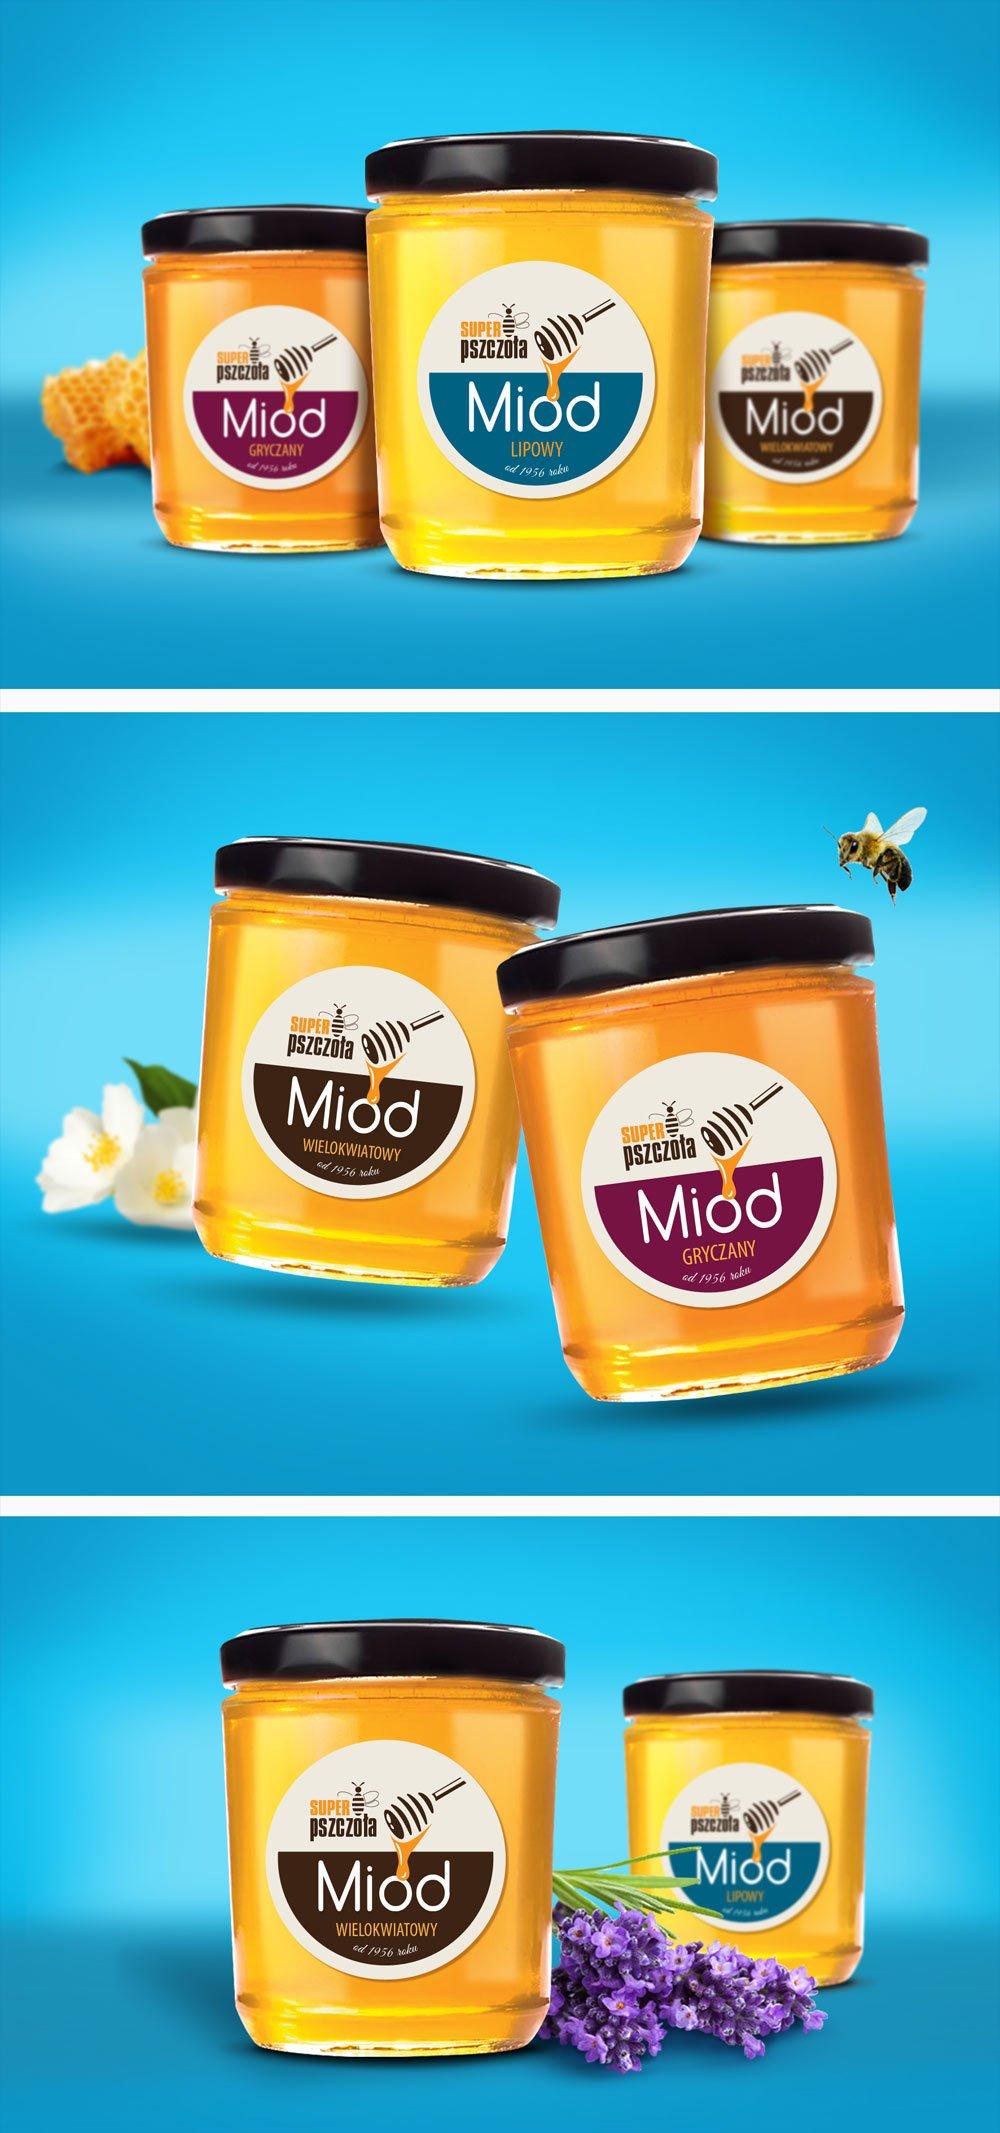 Packaging Miód Super Pszczoła